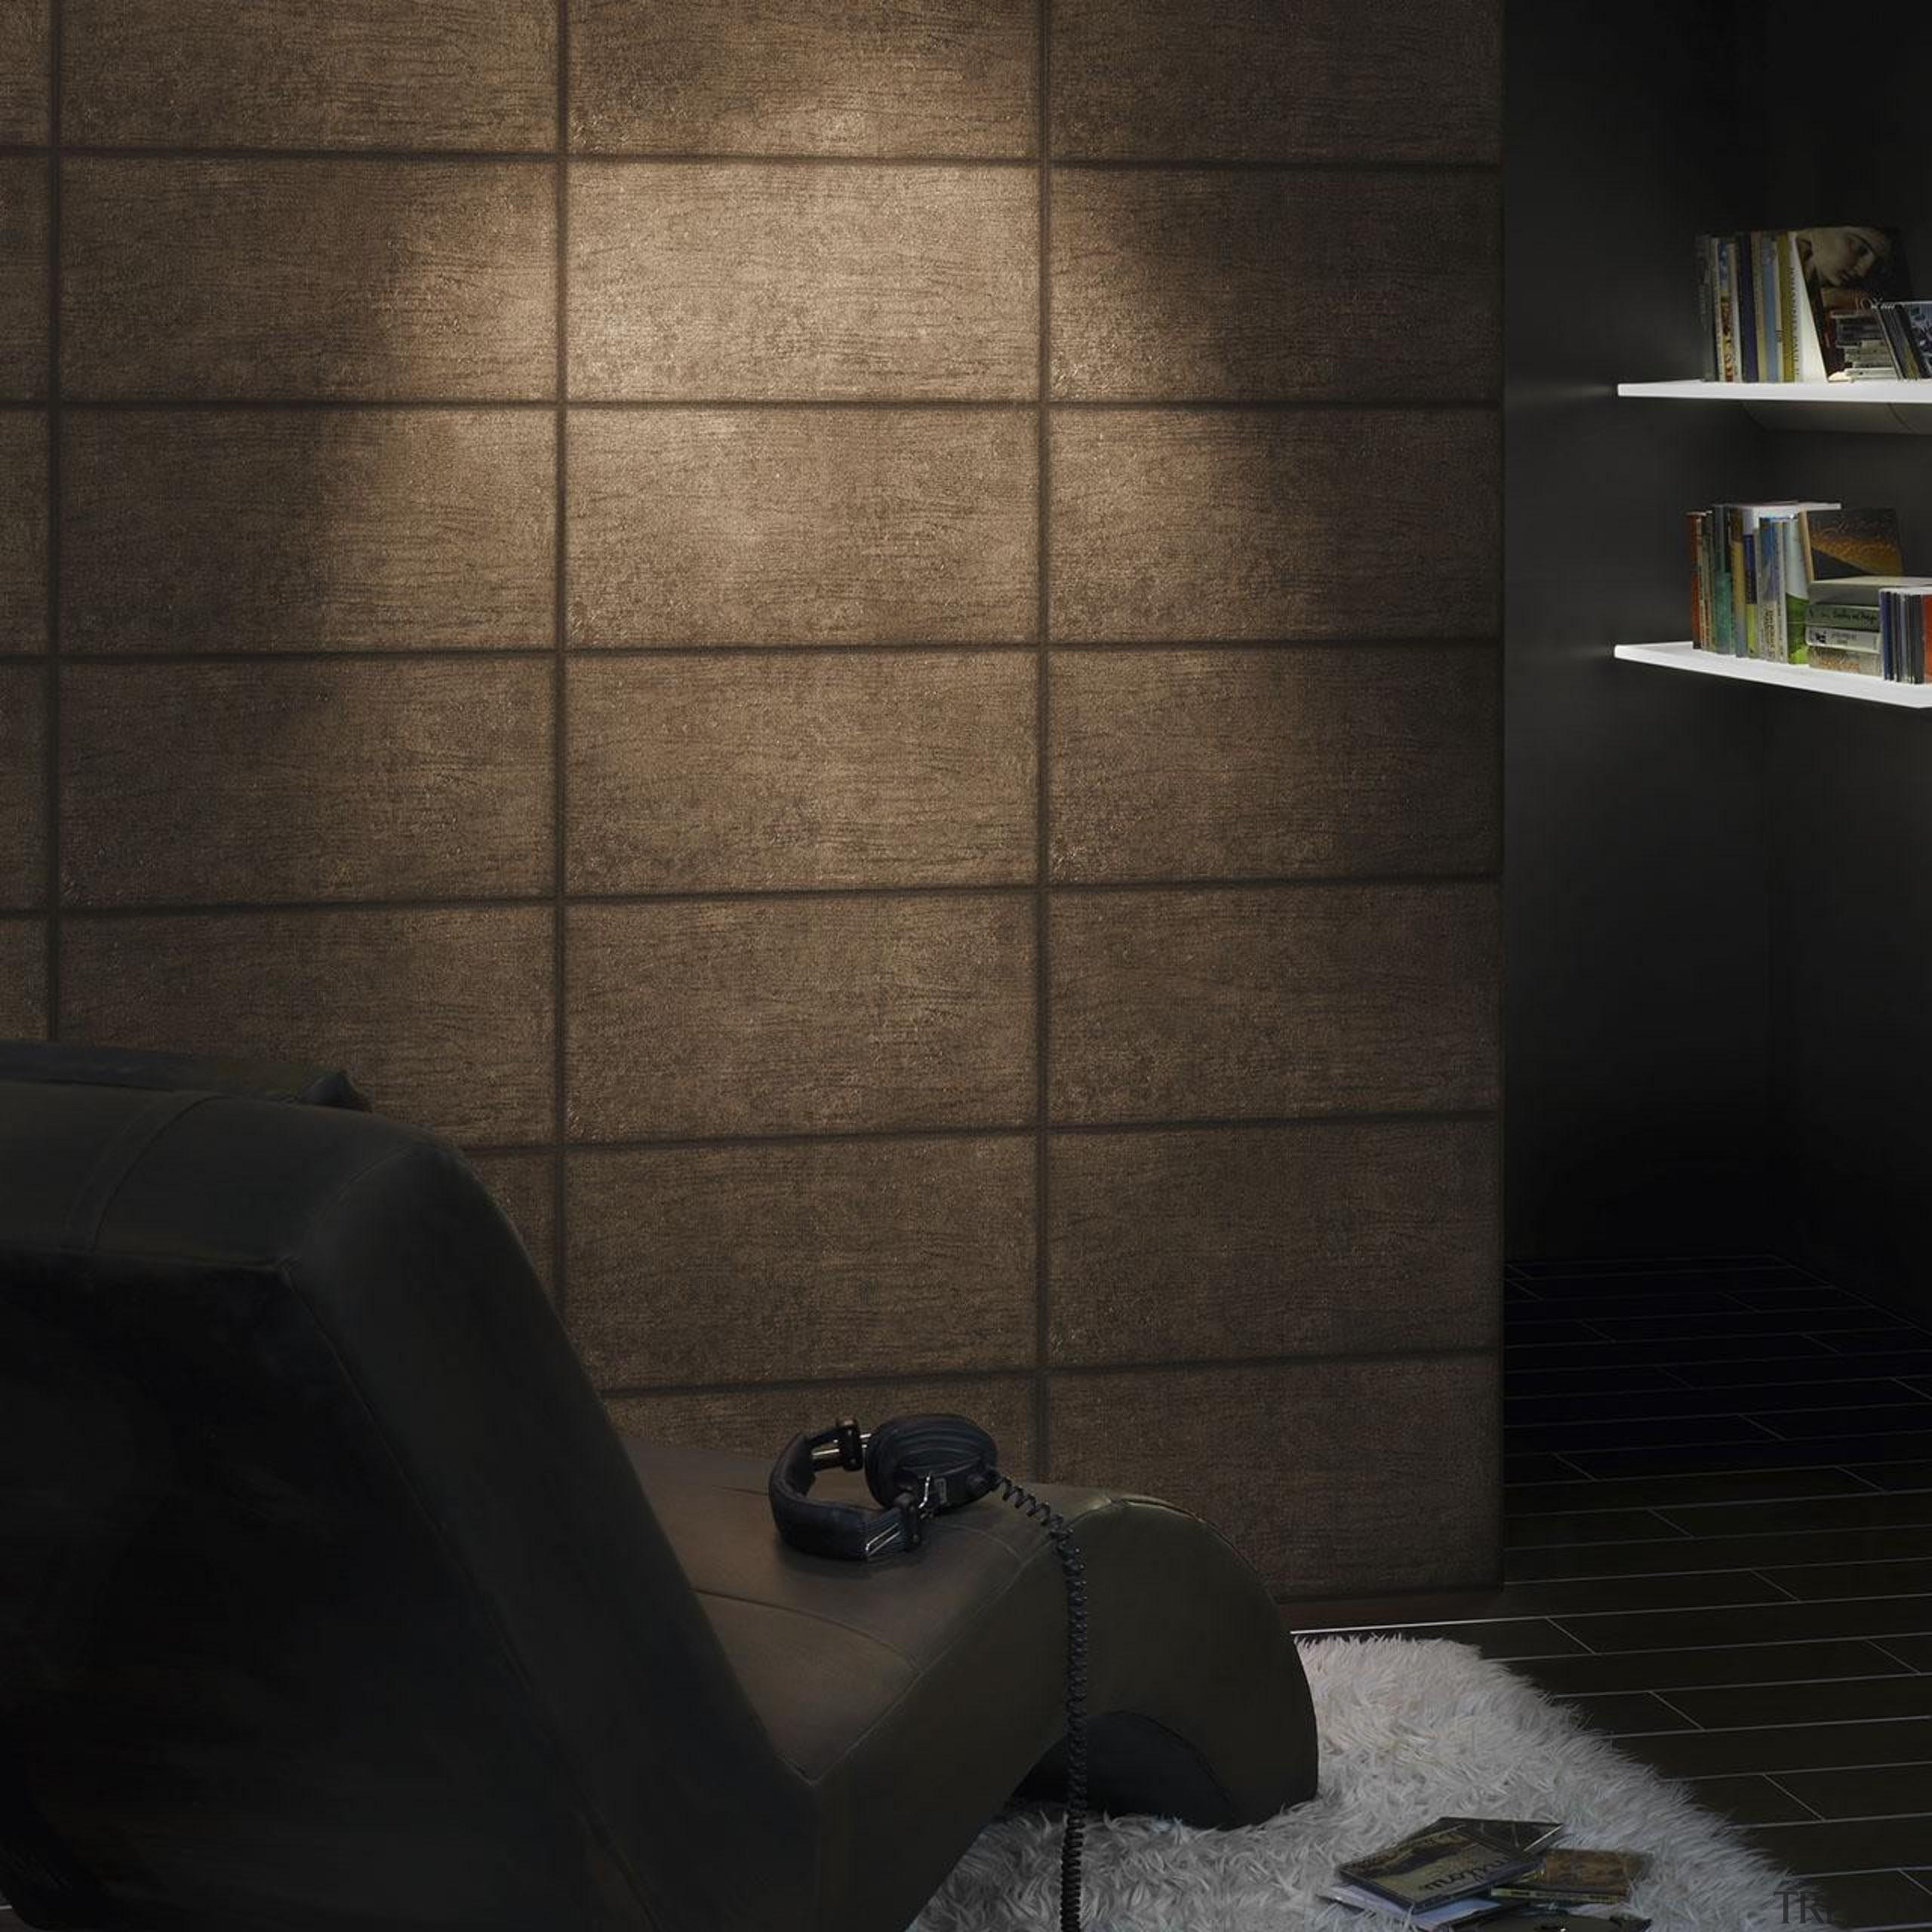 Modern Style Range - floor   flooring   floor, flooring, glass, hardwood, interior design, tile, wall, window, wood, black